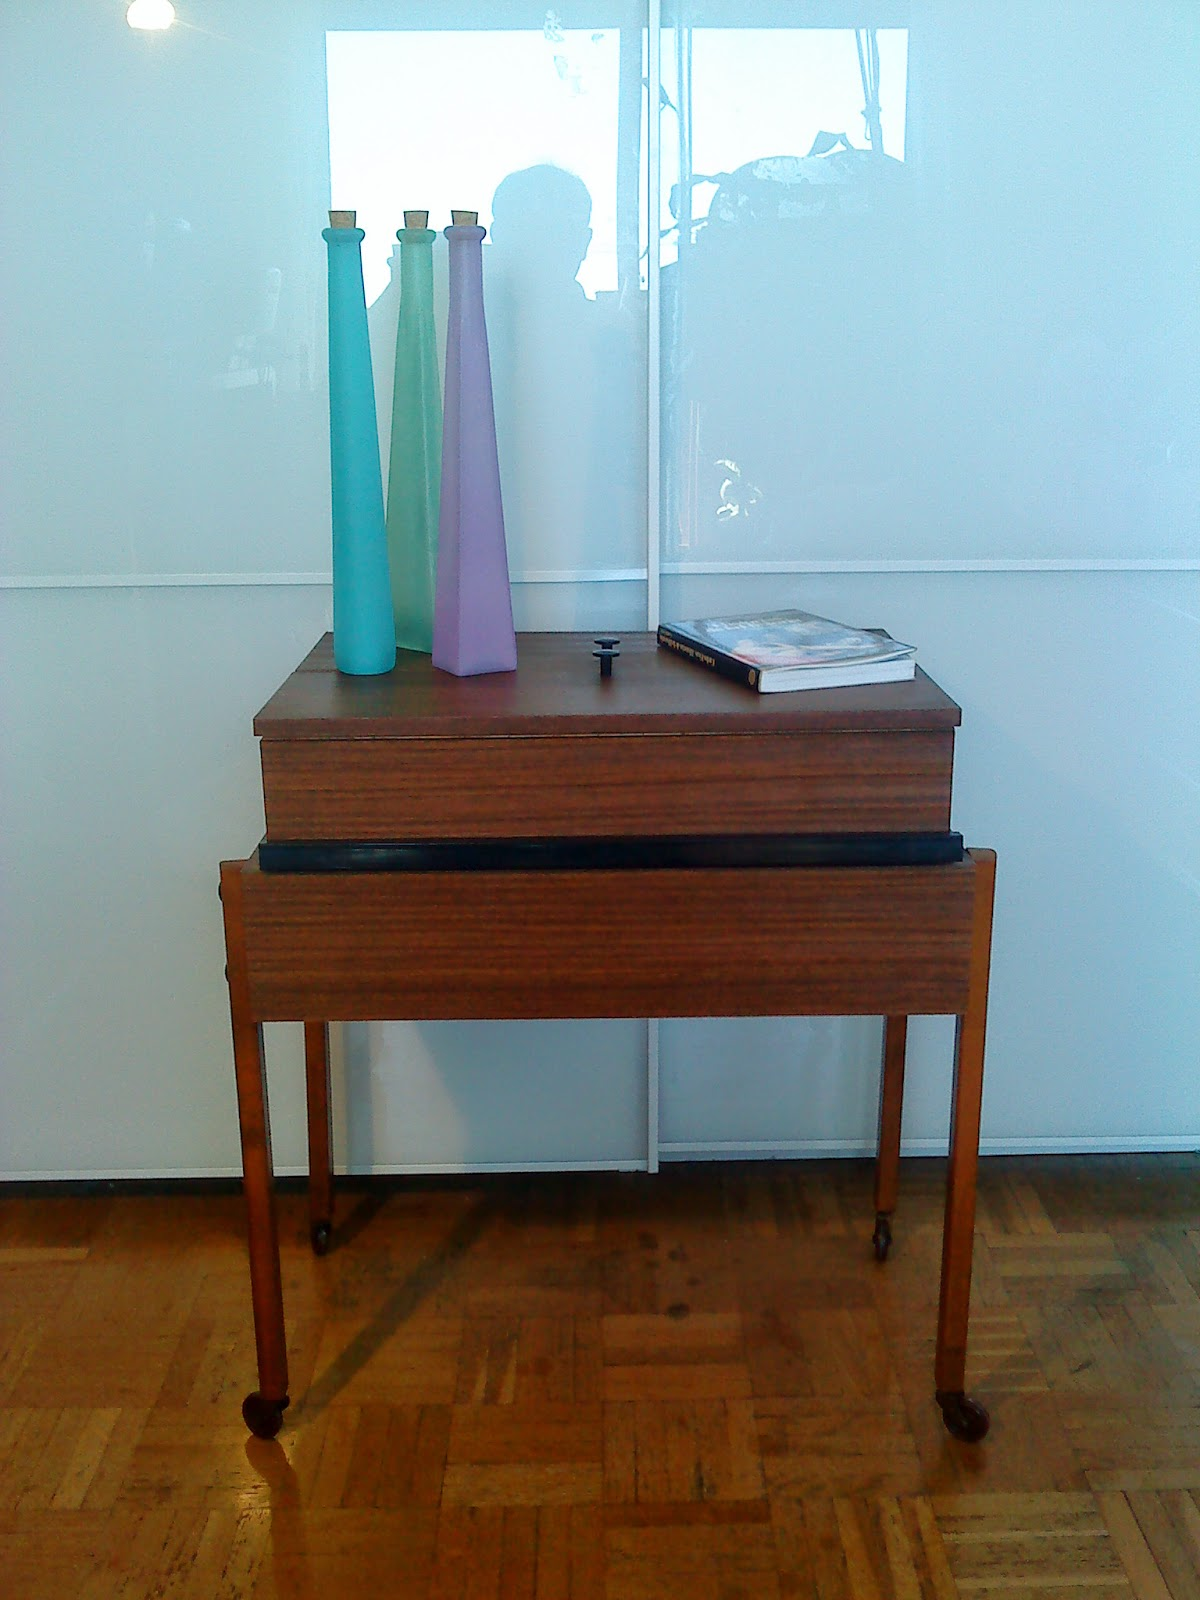 Area vintage dise o mueble auxiliar dise o a os 60 vintage - Muebles anos 60 ...